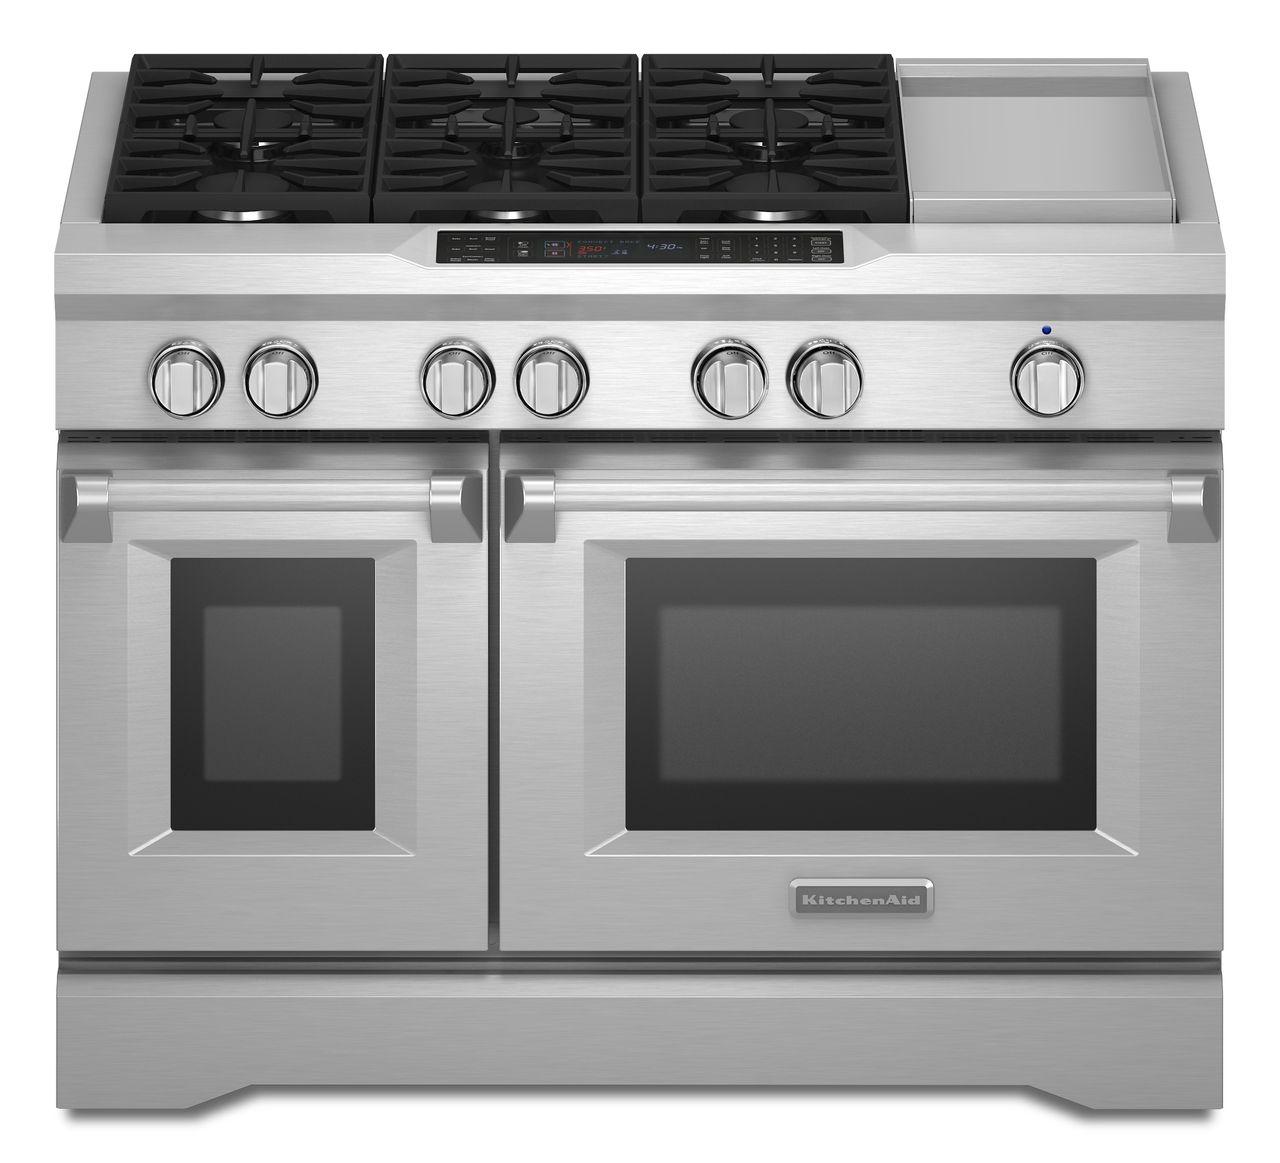 KitchenAid Range/Stove/Oven Model KDRS483VSS03 Parts